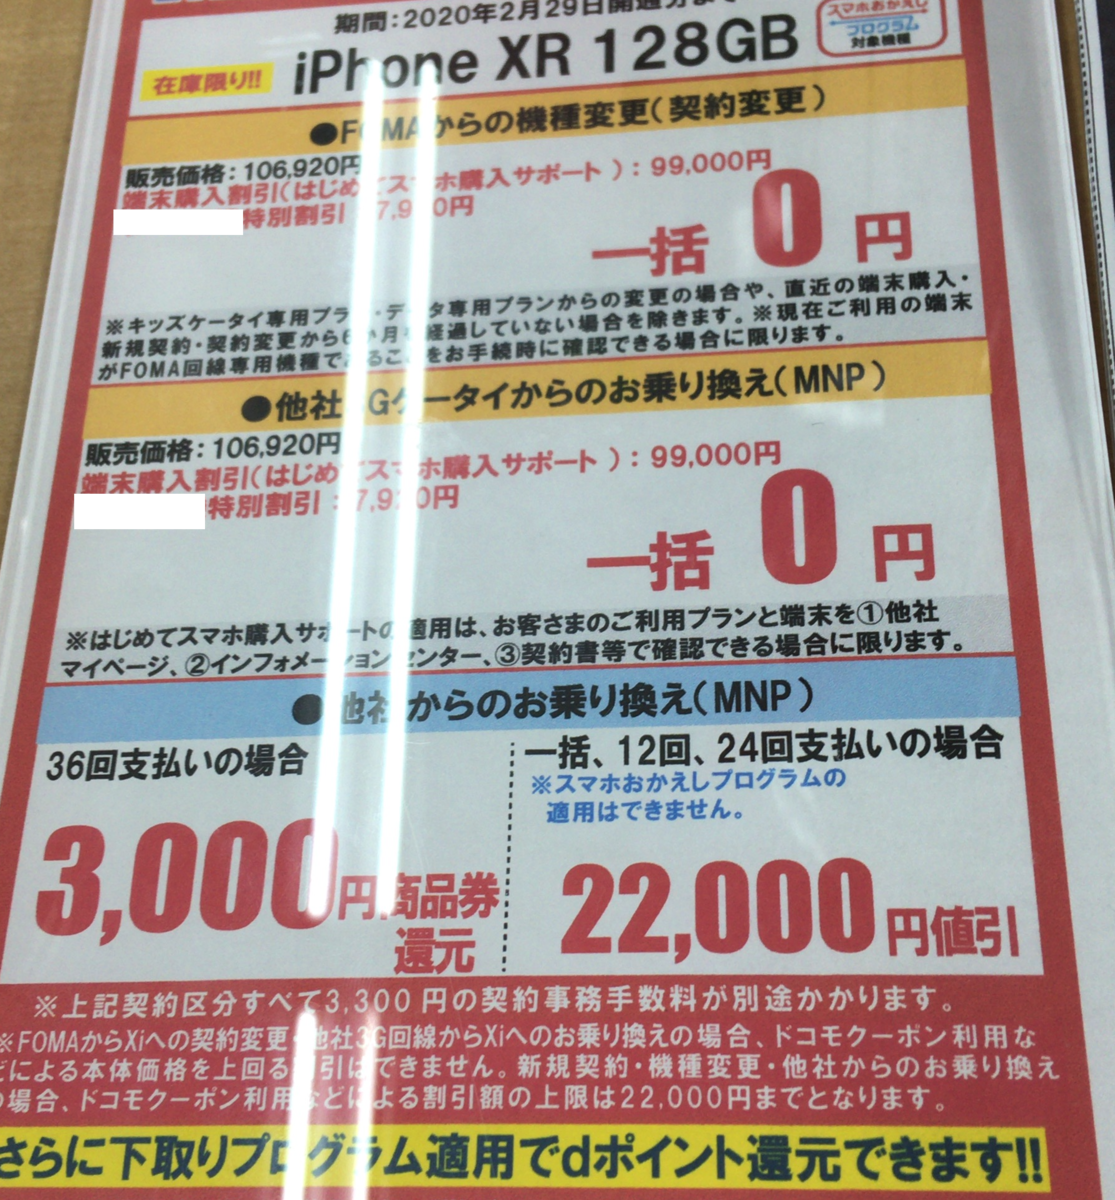 f:id:koiwai_chinatsu:20200206132607p:plain